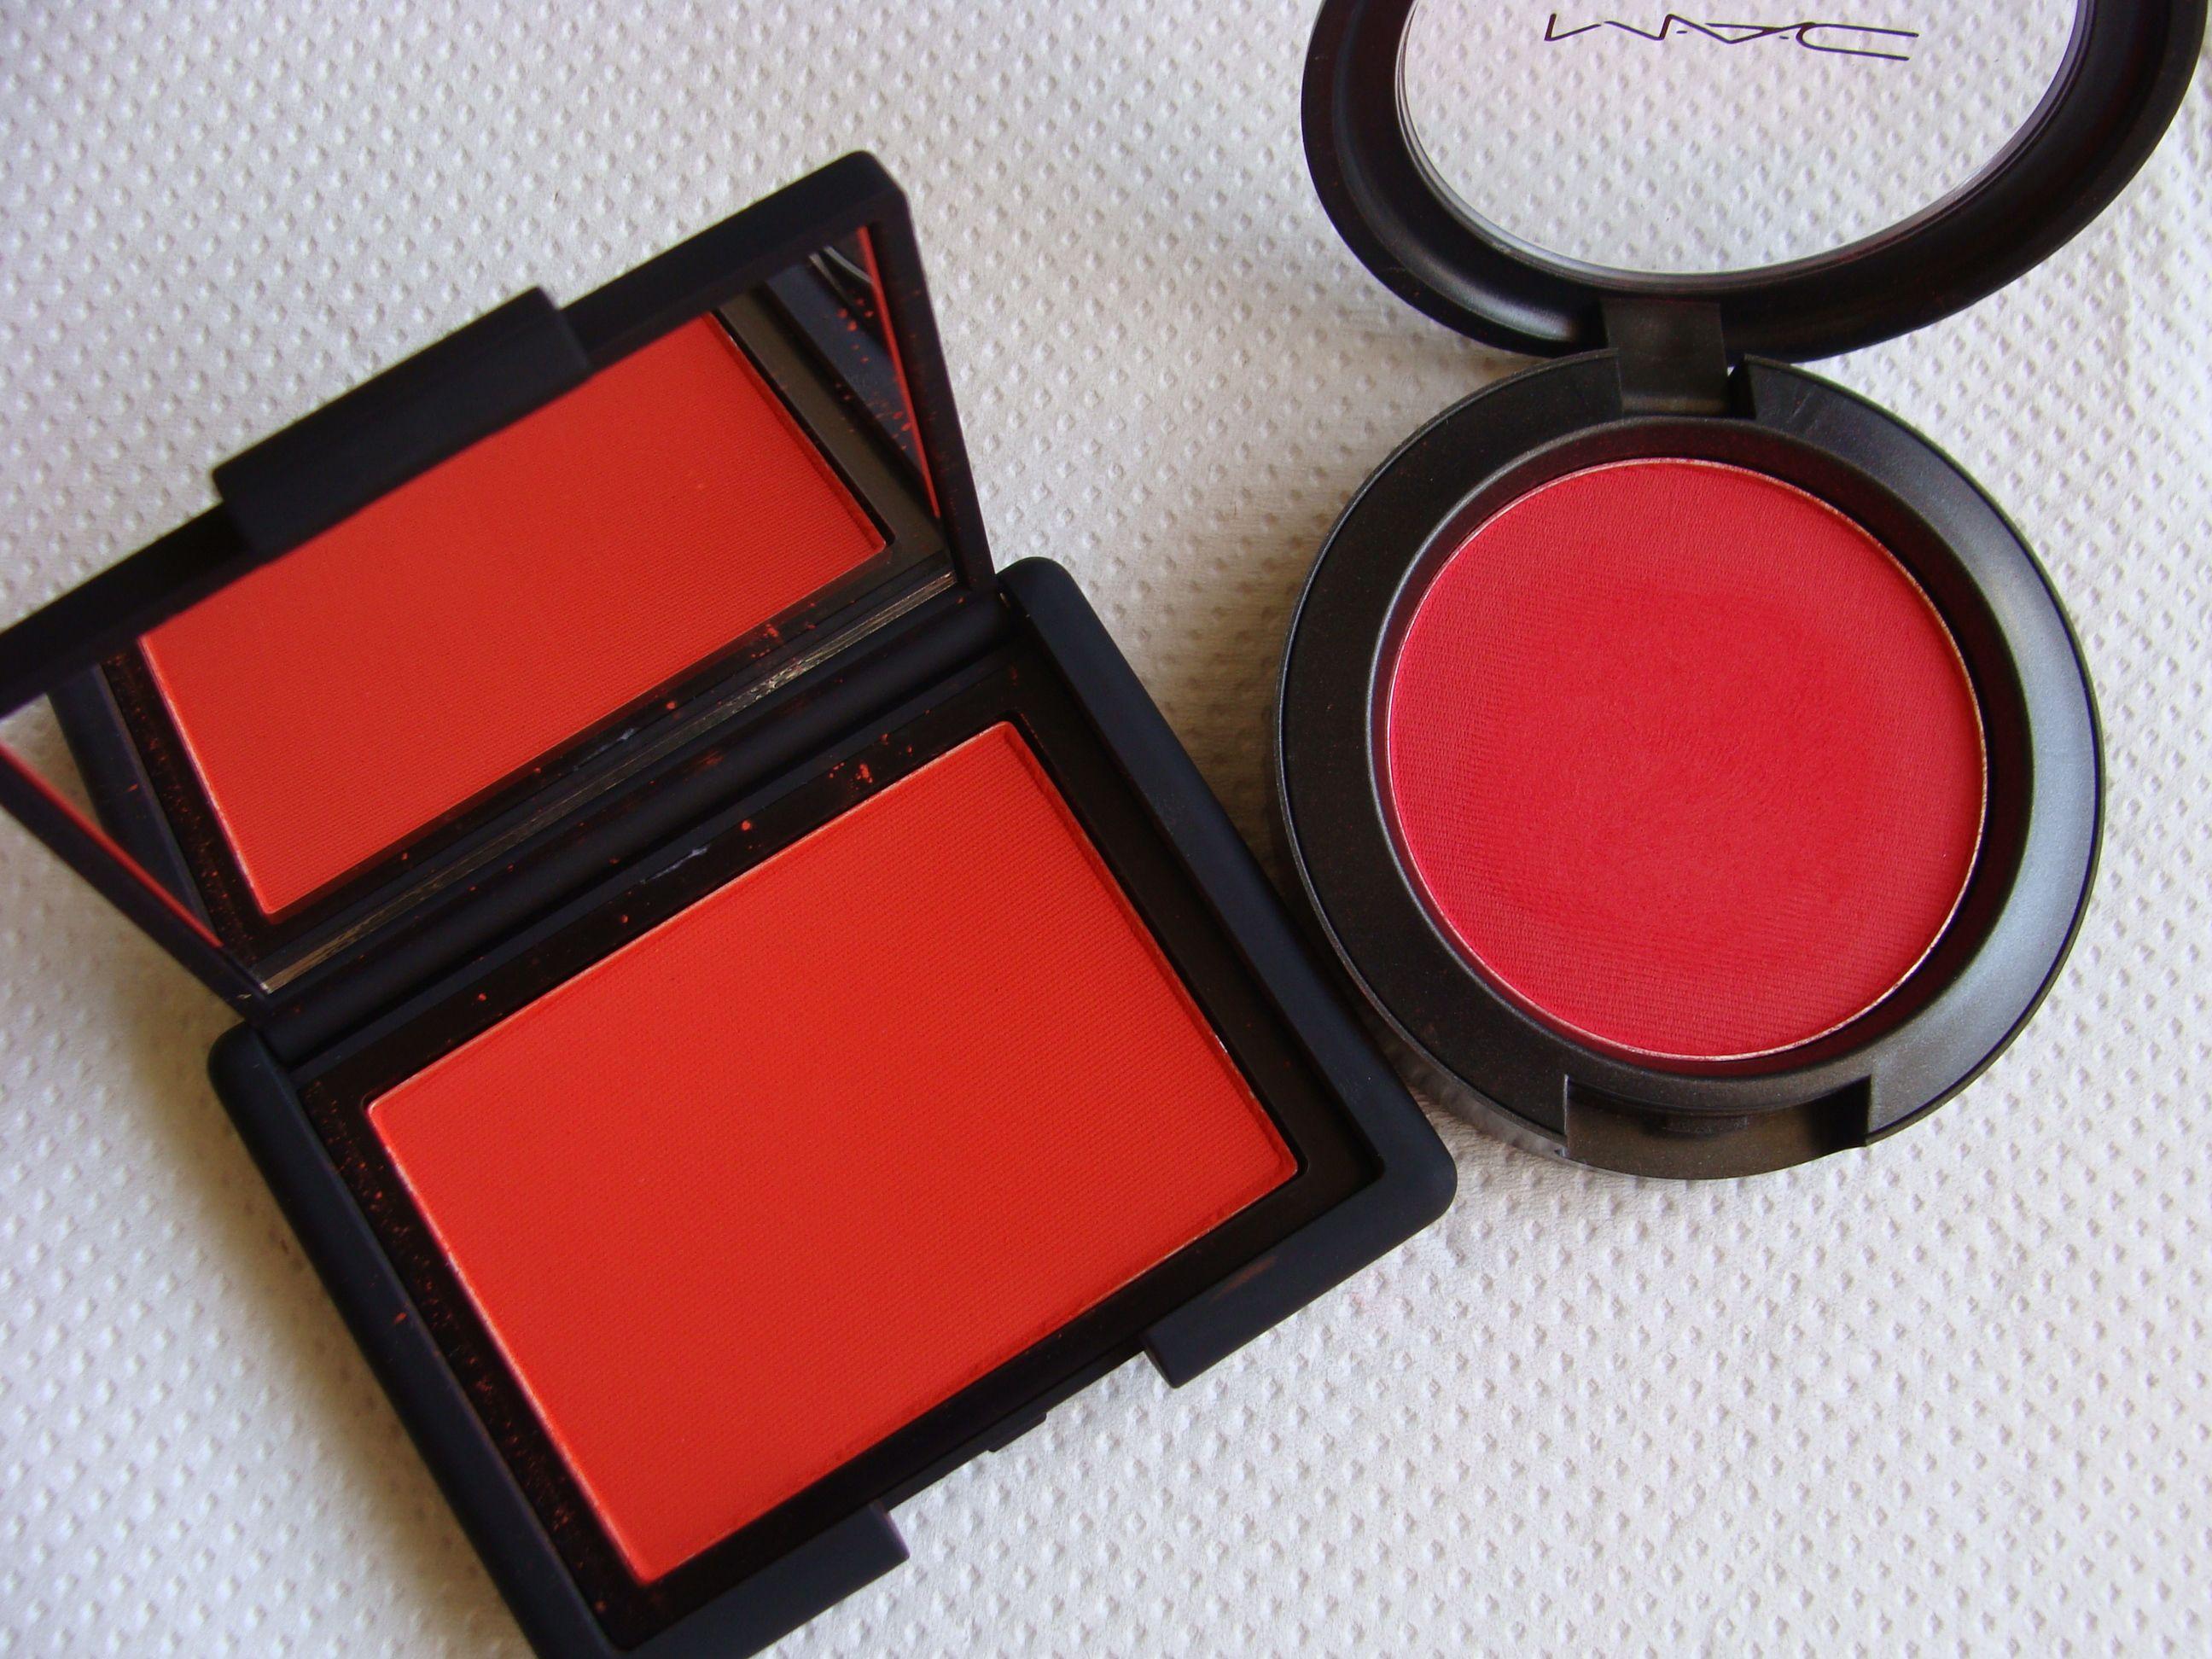 Nars Blush In Exhibit A Vs Mac Frankly Scarlet  Blush -8695